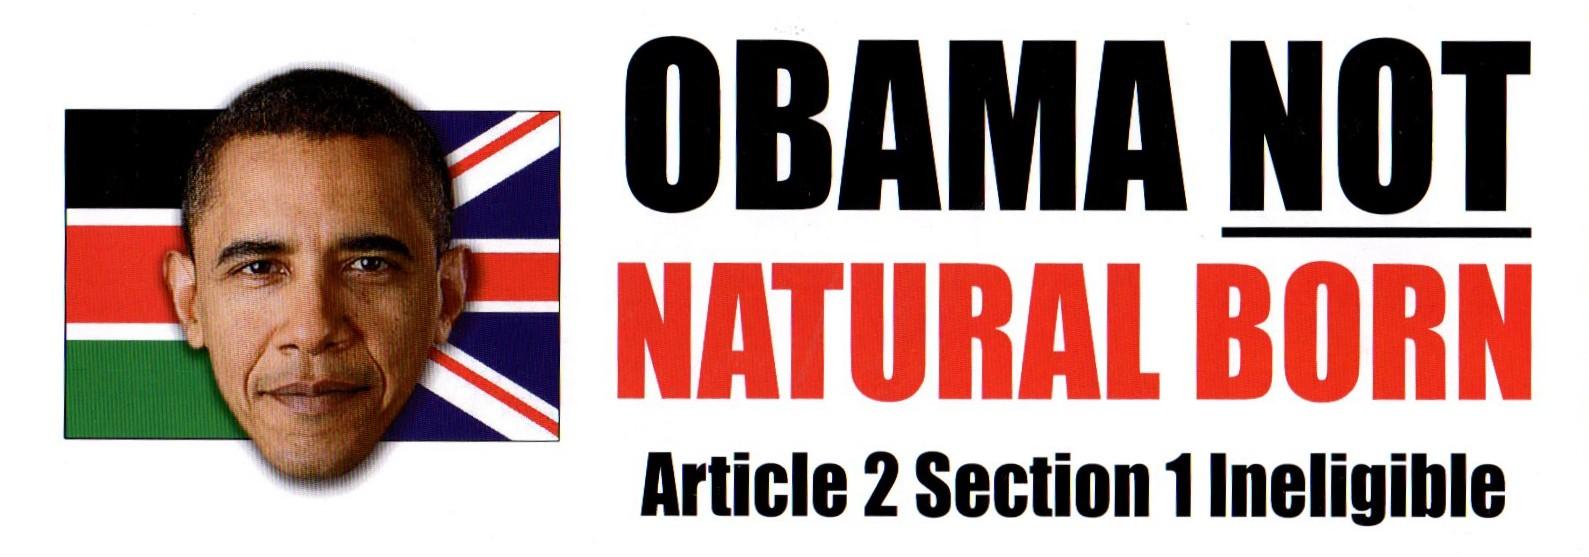 http://3.bp.blogspot.com/_1lGFYYNkw_o/TJ5Nn5LwmAI/AAAAAAAAB_o/bHwcOl0ST_I/s1600/ObamaIneligibleNOTnaturalBorn.jpg